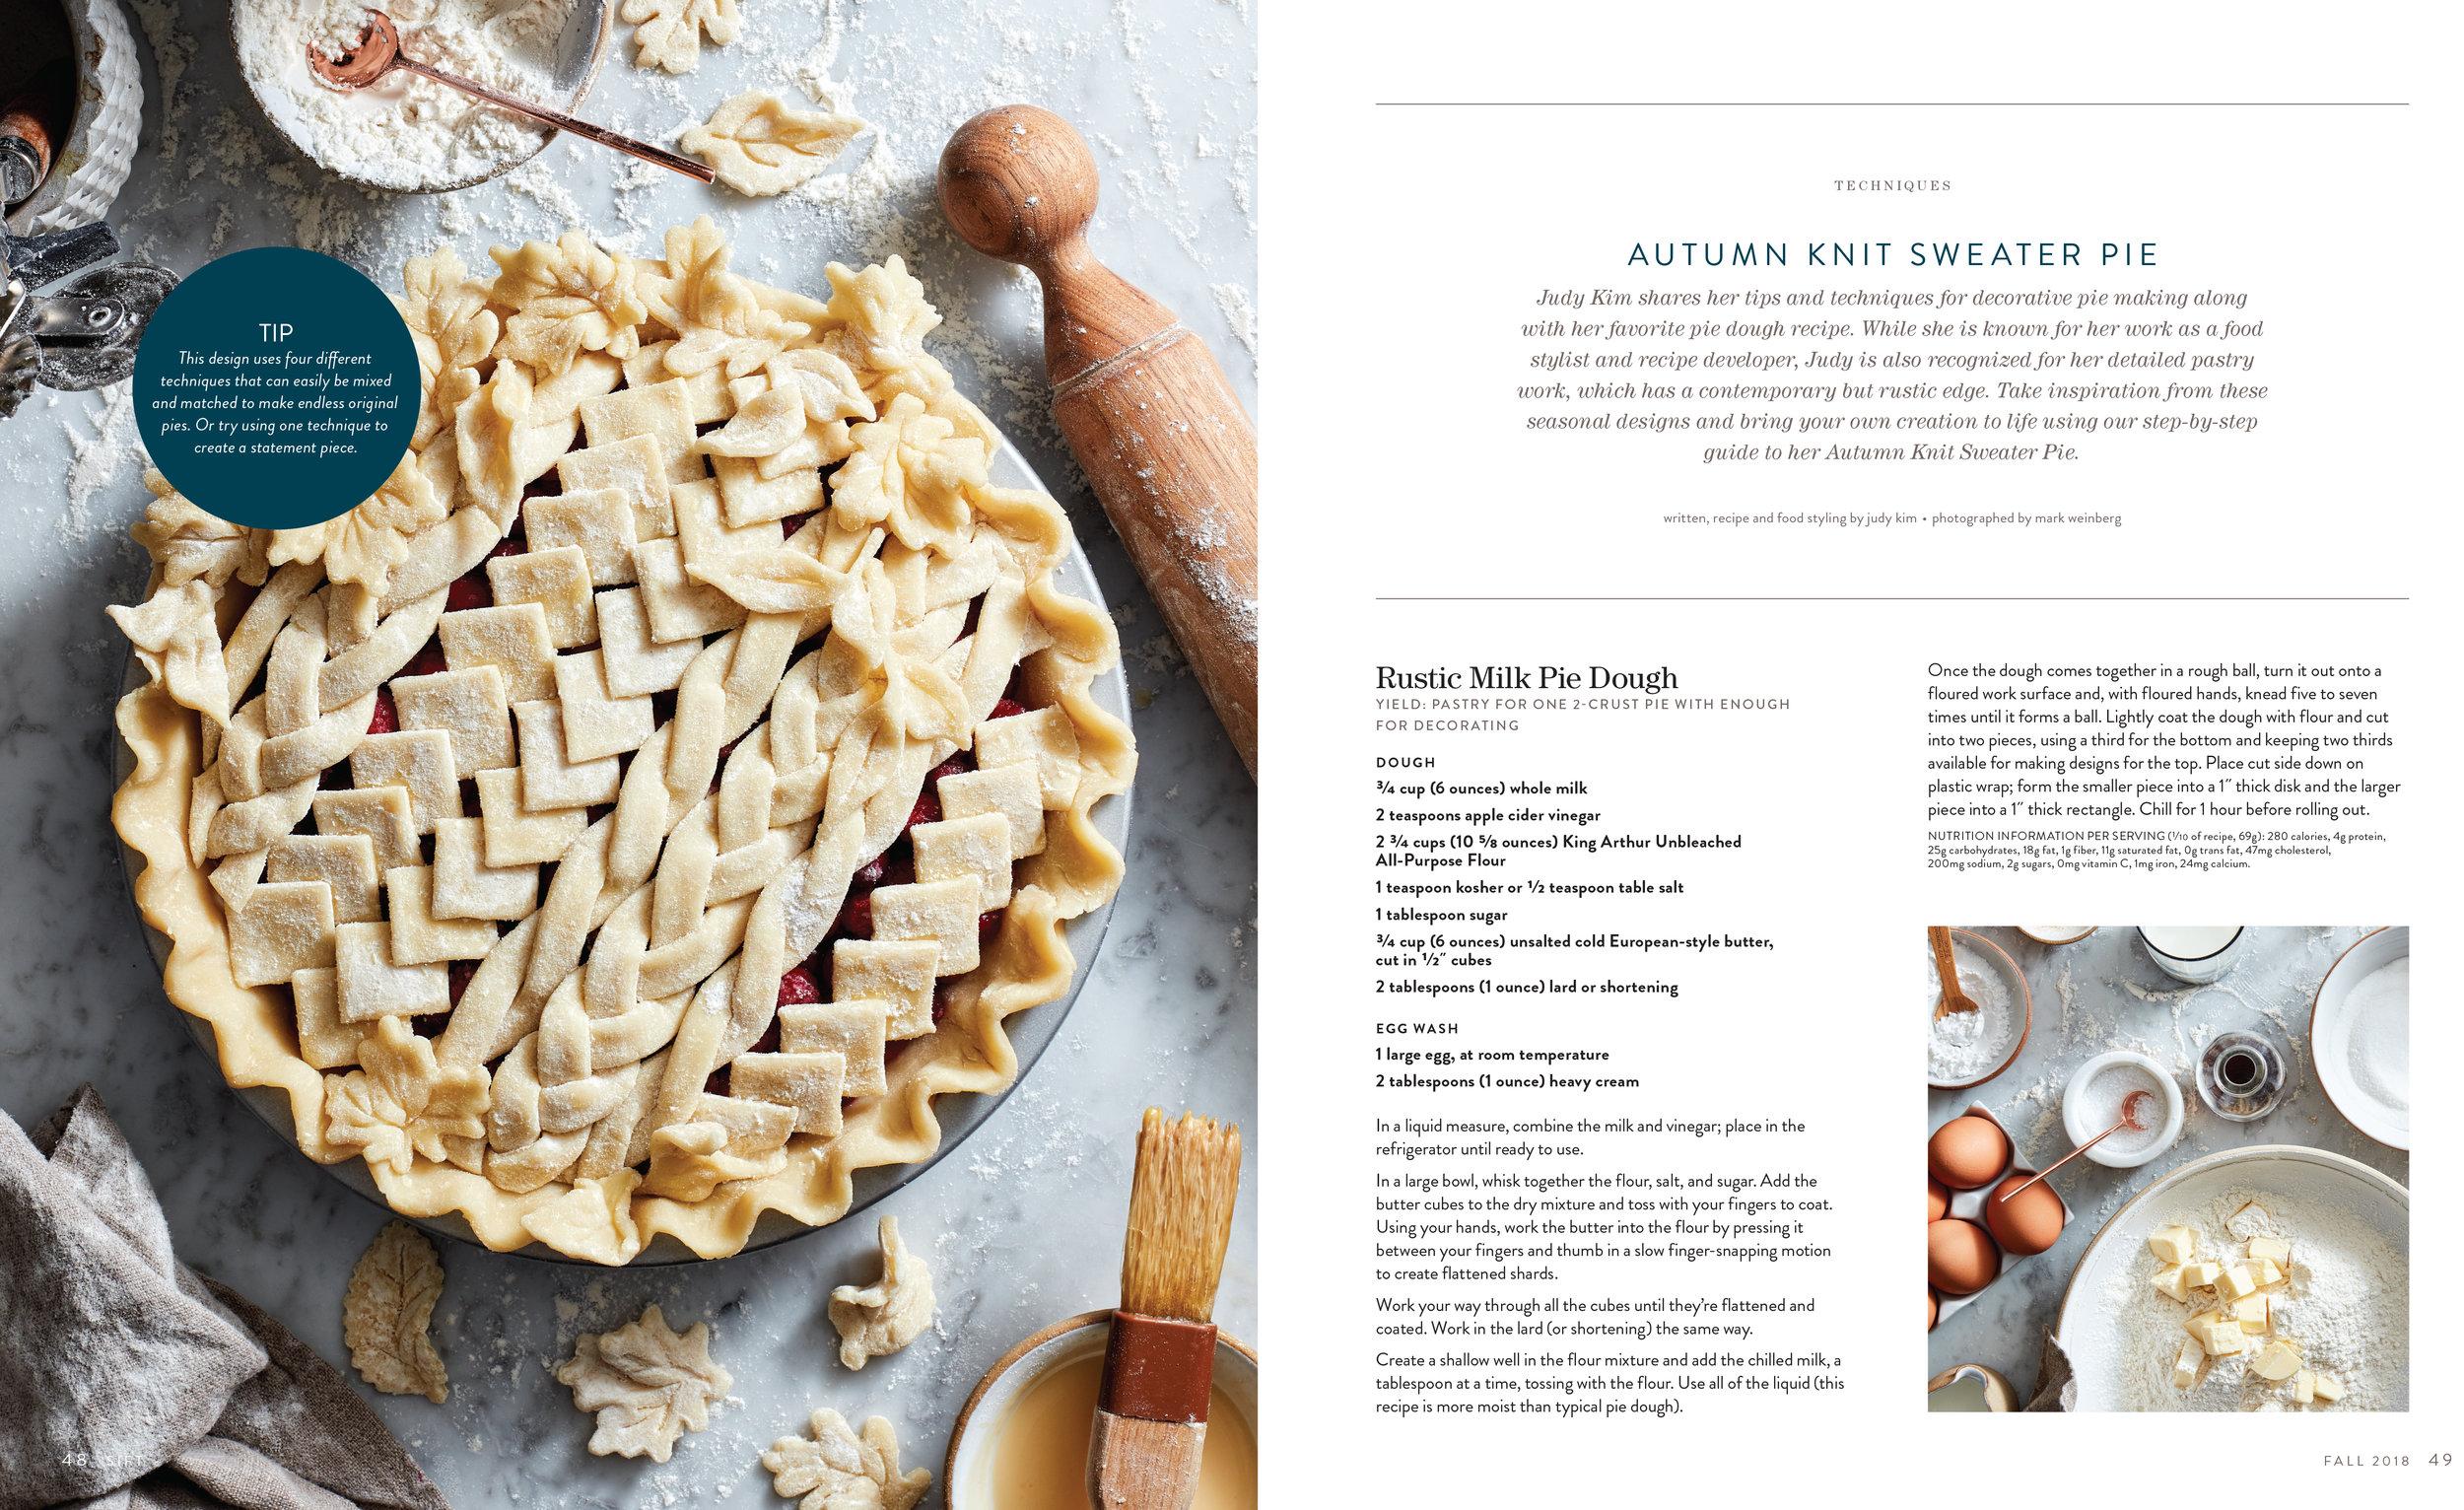 SIFT King Arthur Magazine, Fall 2018. Food Styling/Recipe: Judy Kim Photo by Mark Weinberg